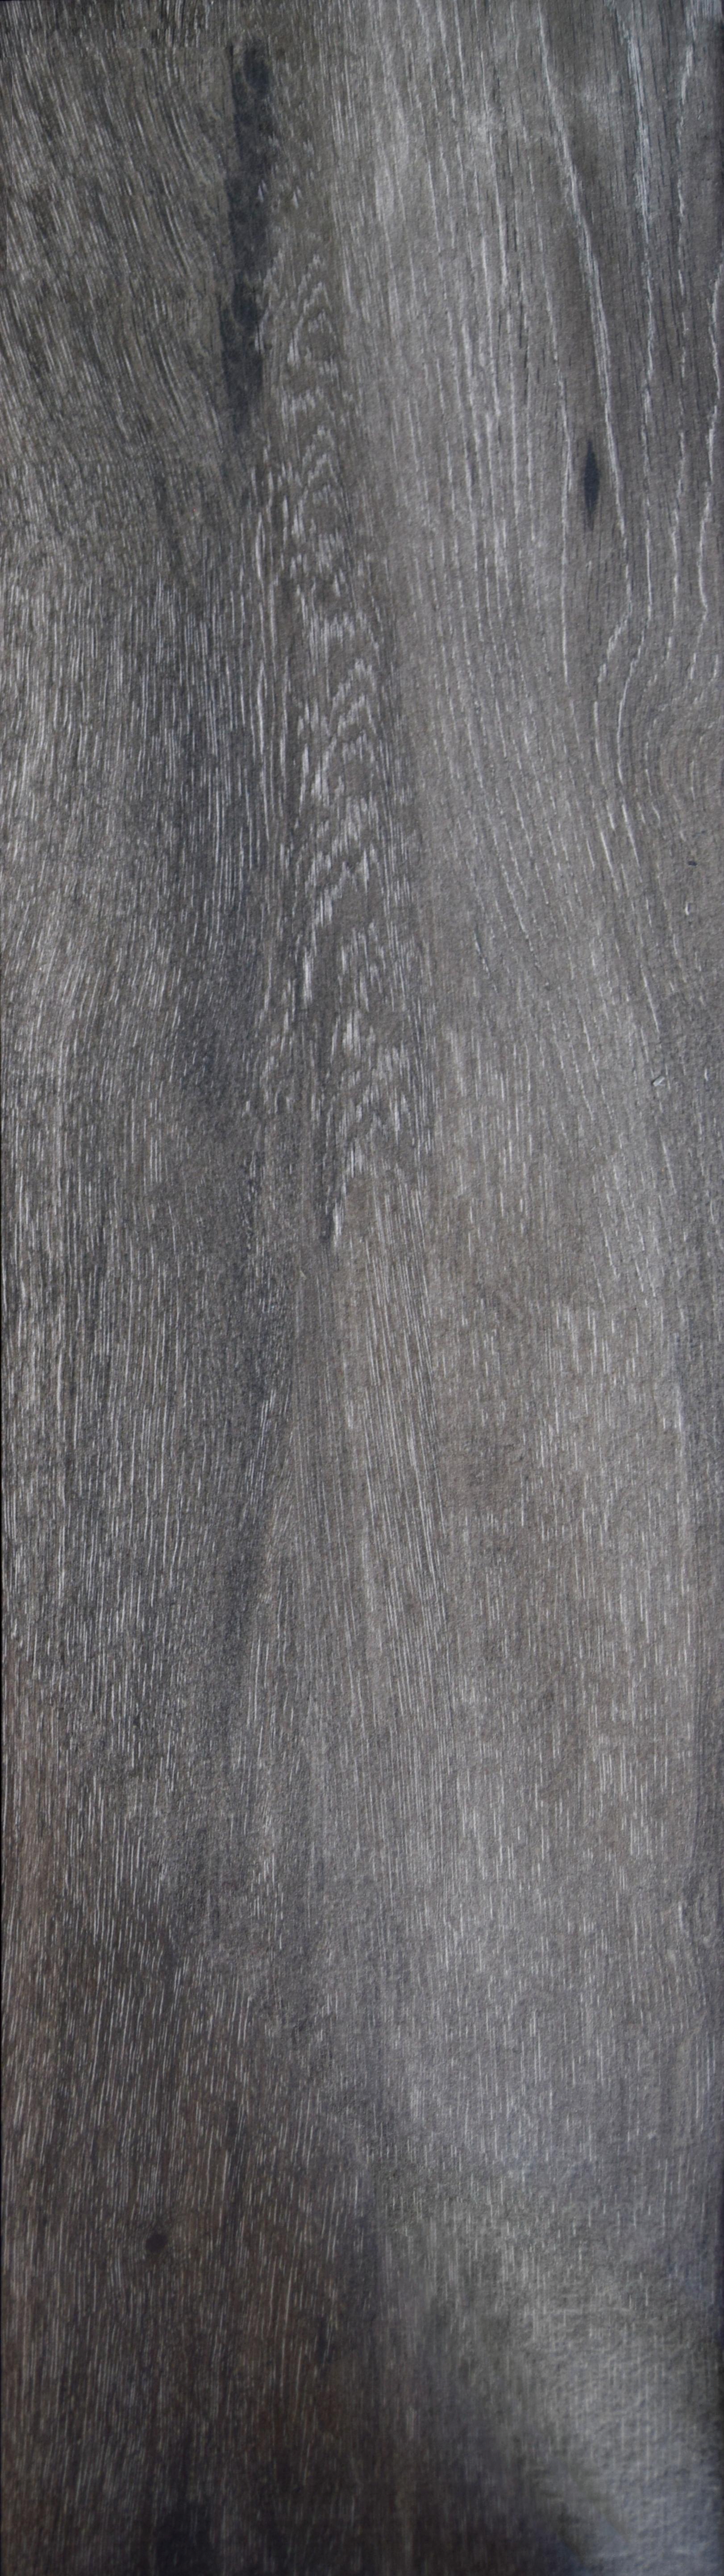 PORCE P.R 23.3X120 SECUOYA GRIS